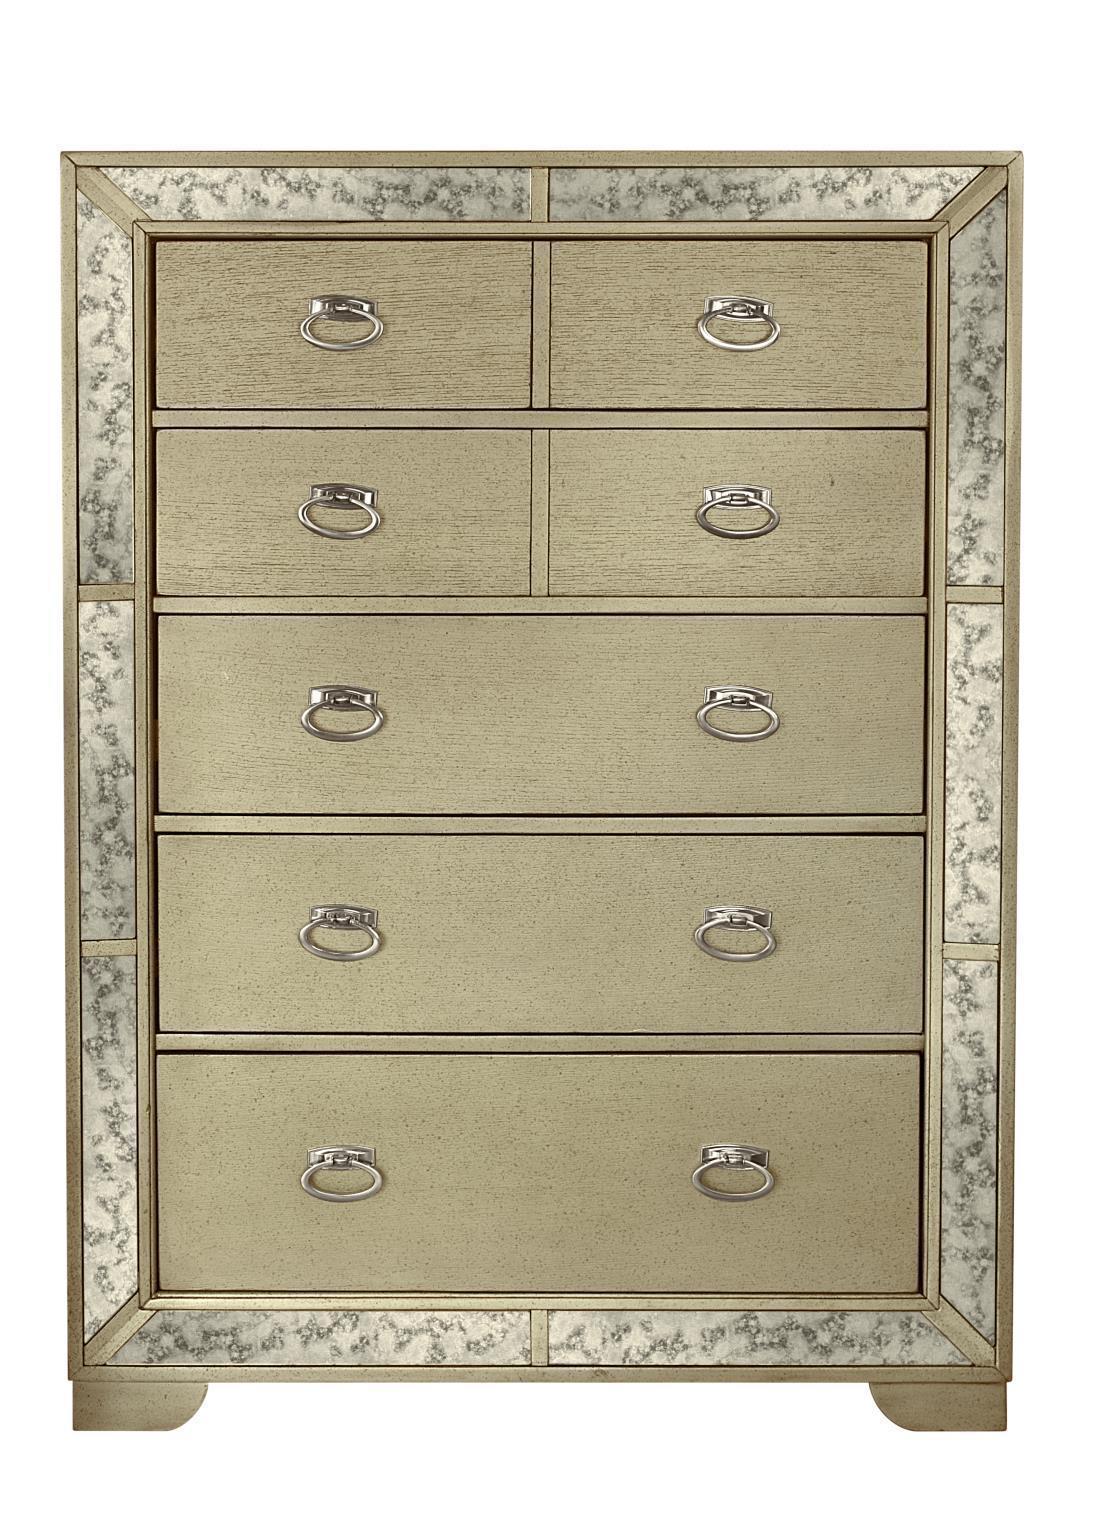 Myco Furniture Ma190q Madi Diamond Tufted Headboard Queen Bedroom Set 6pcs